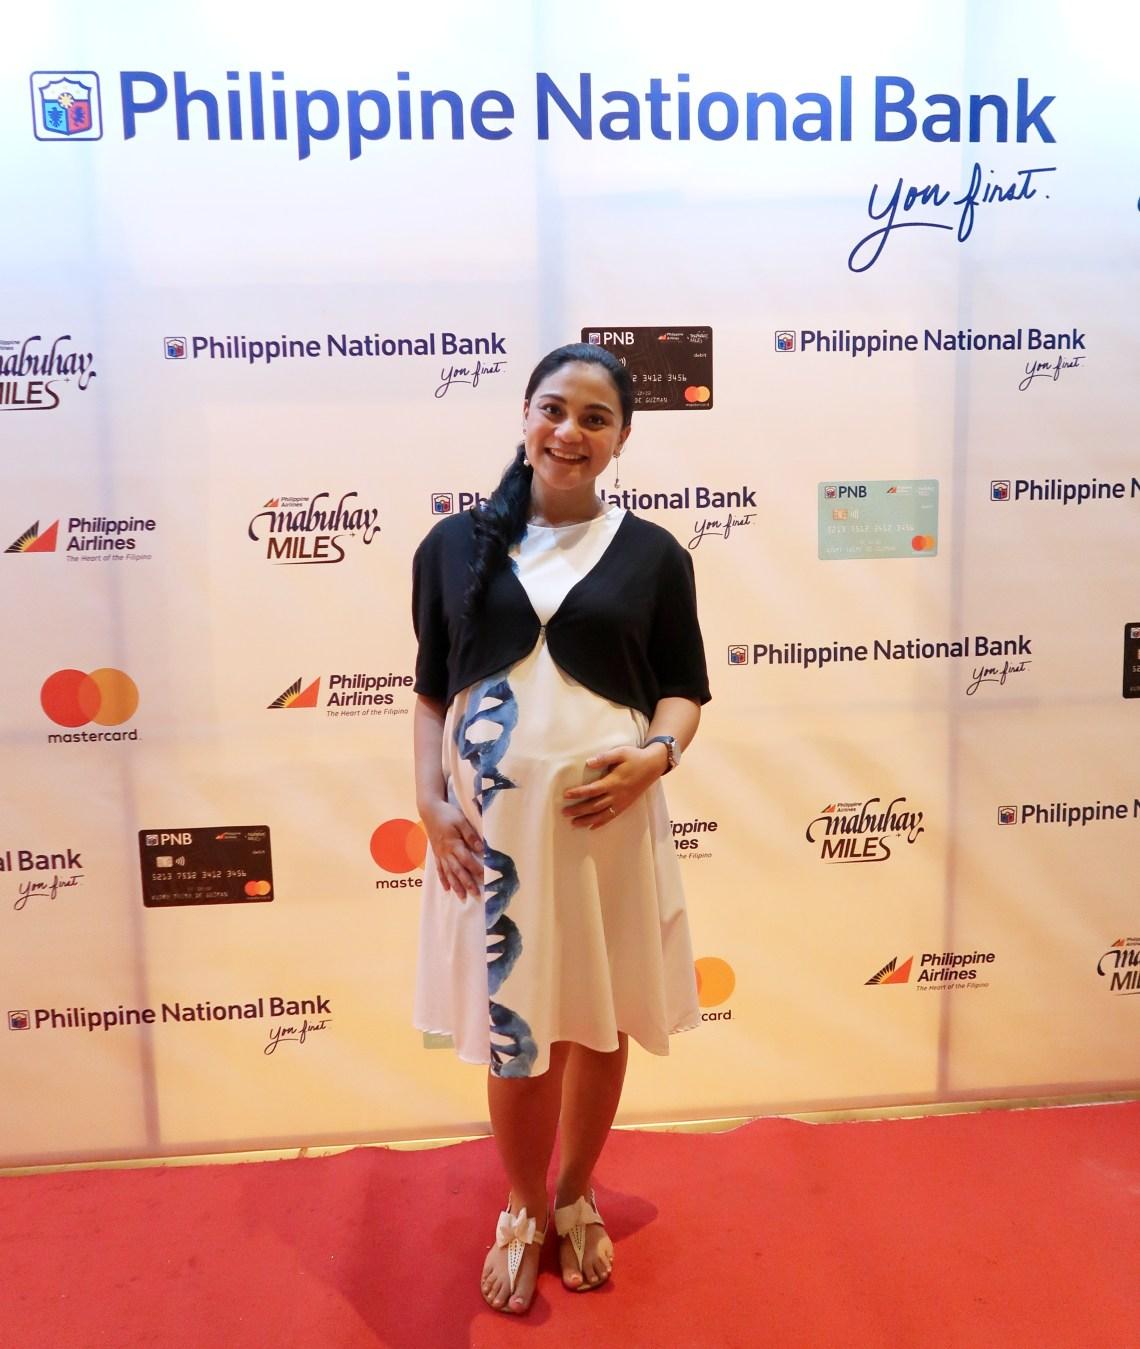 dyosathemomma: PNB-PAL Mabuhay Miles Debit Mastercard Launch at Blueleaf Filipinas Pasay